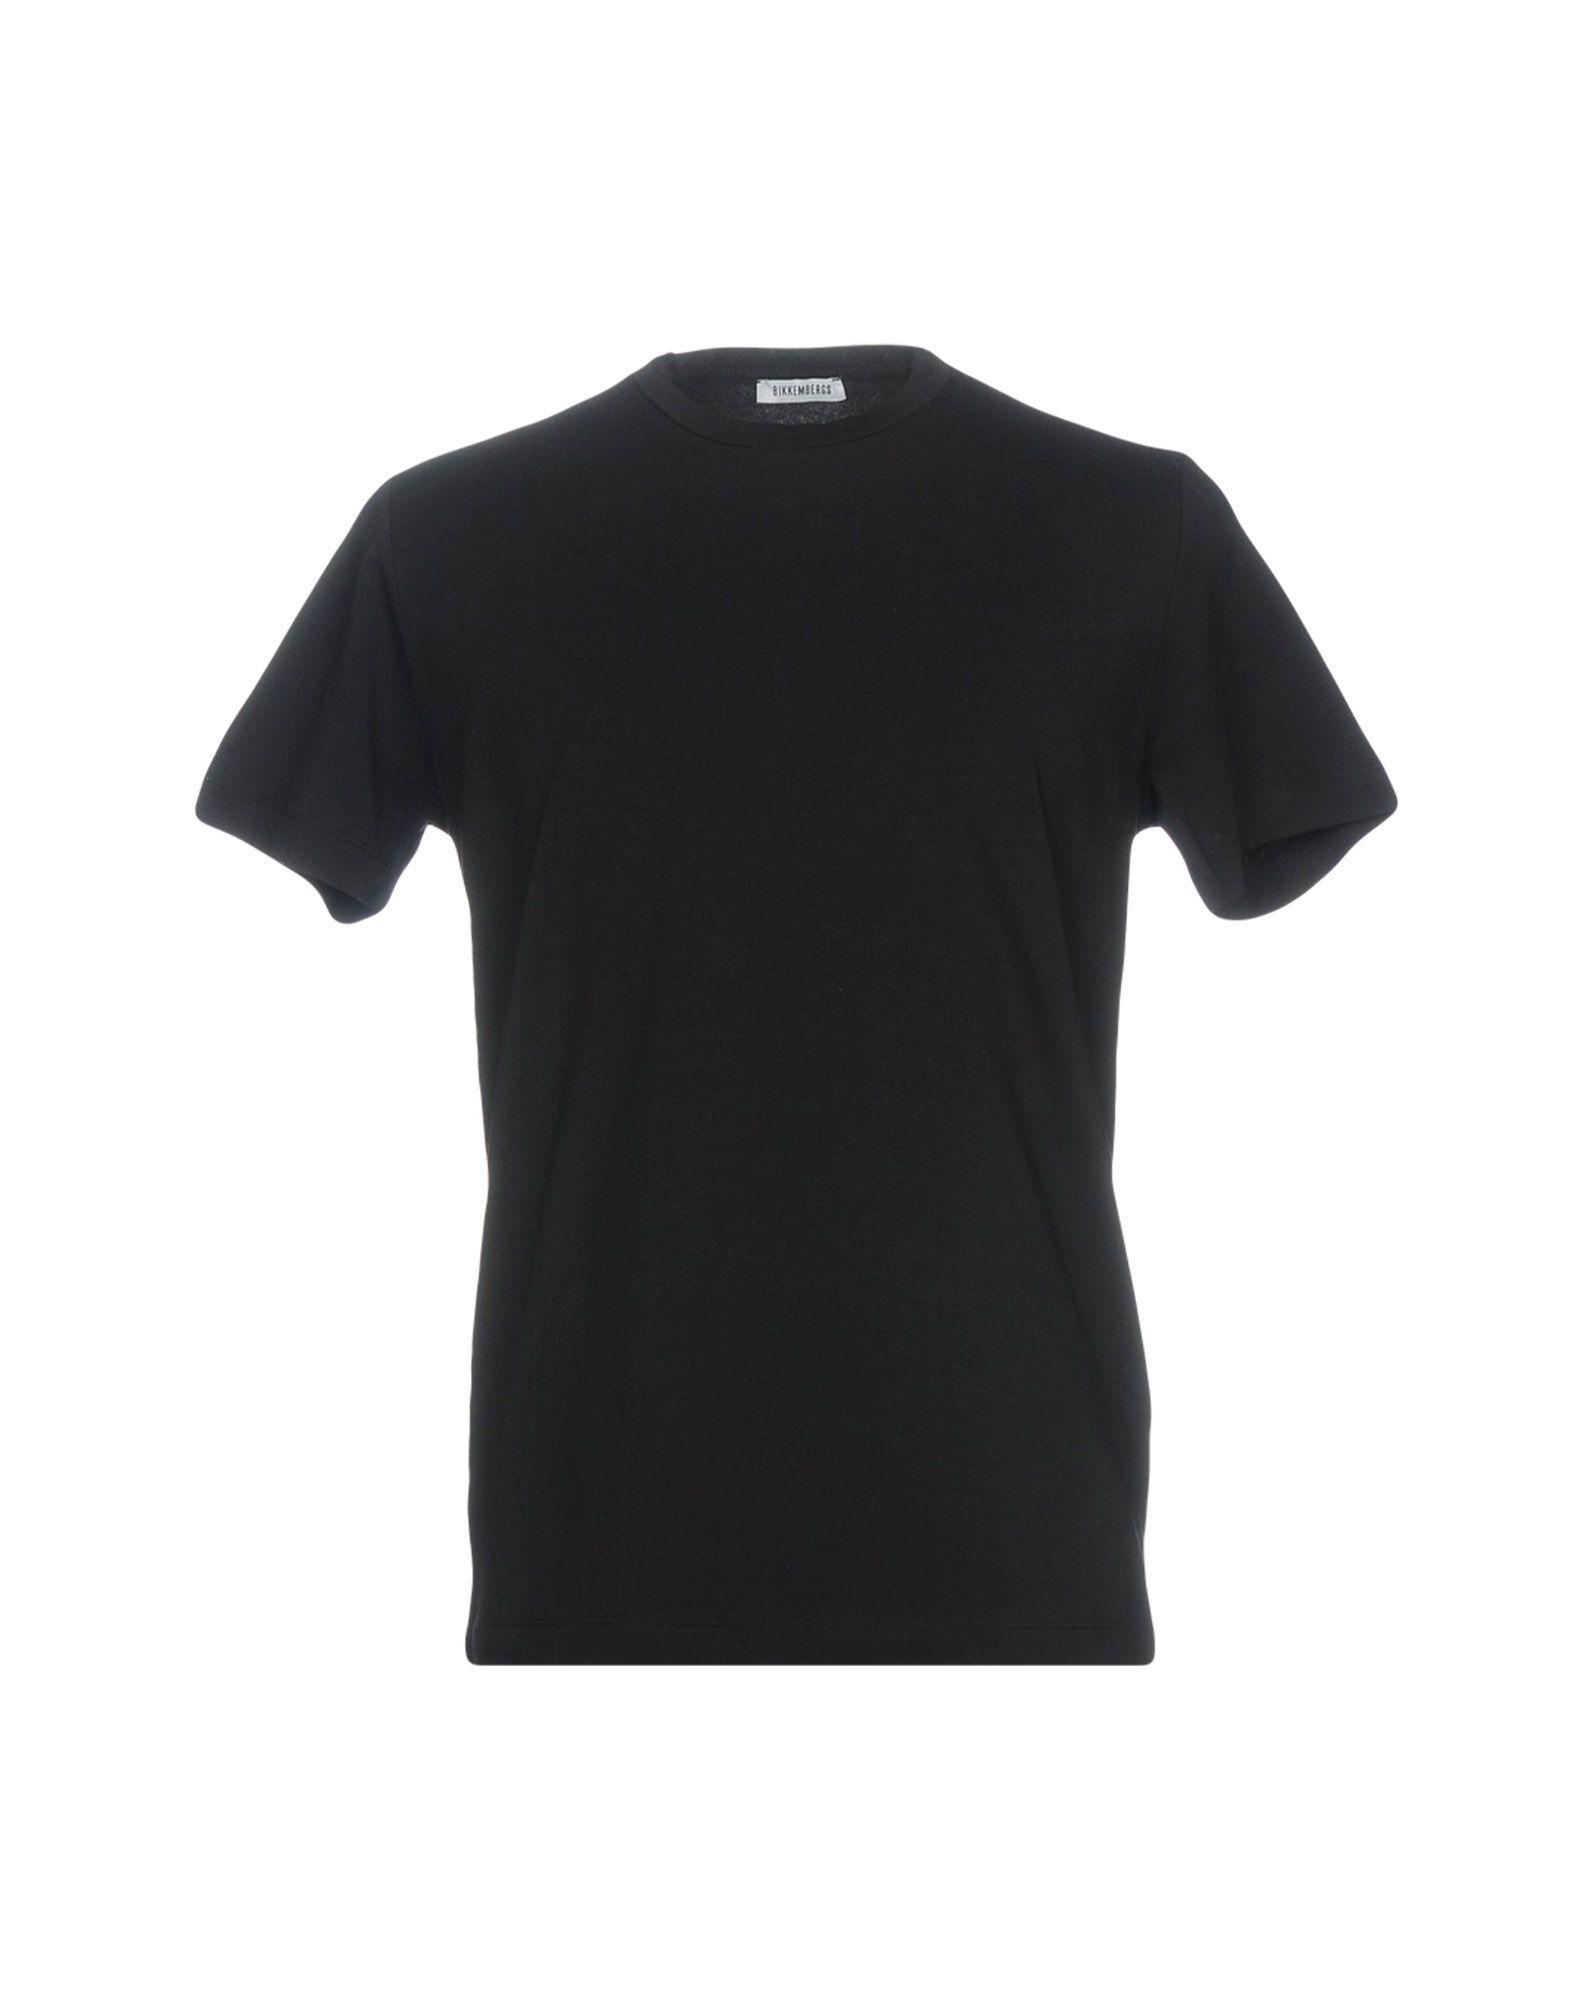 Bikkembergs T-shirts In Black